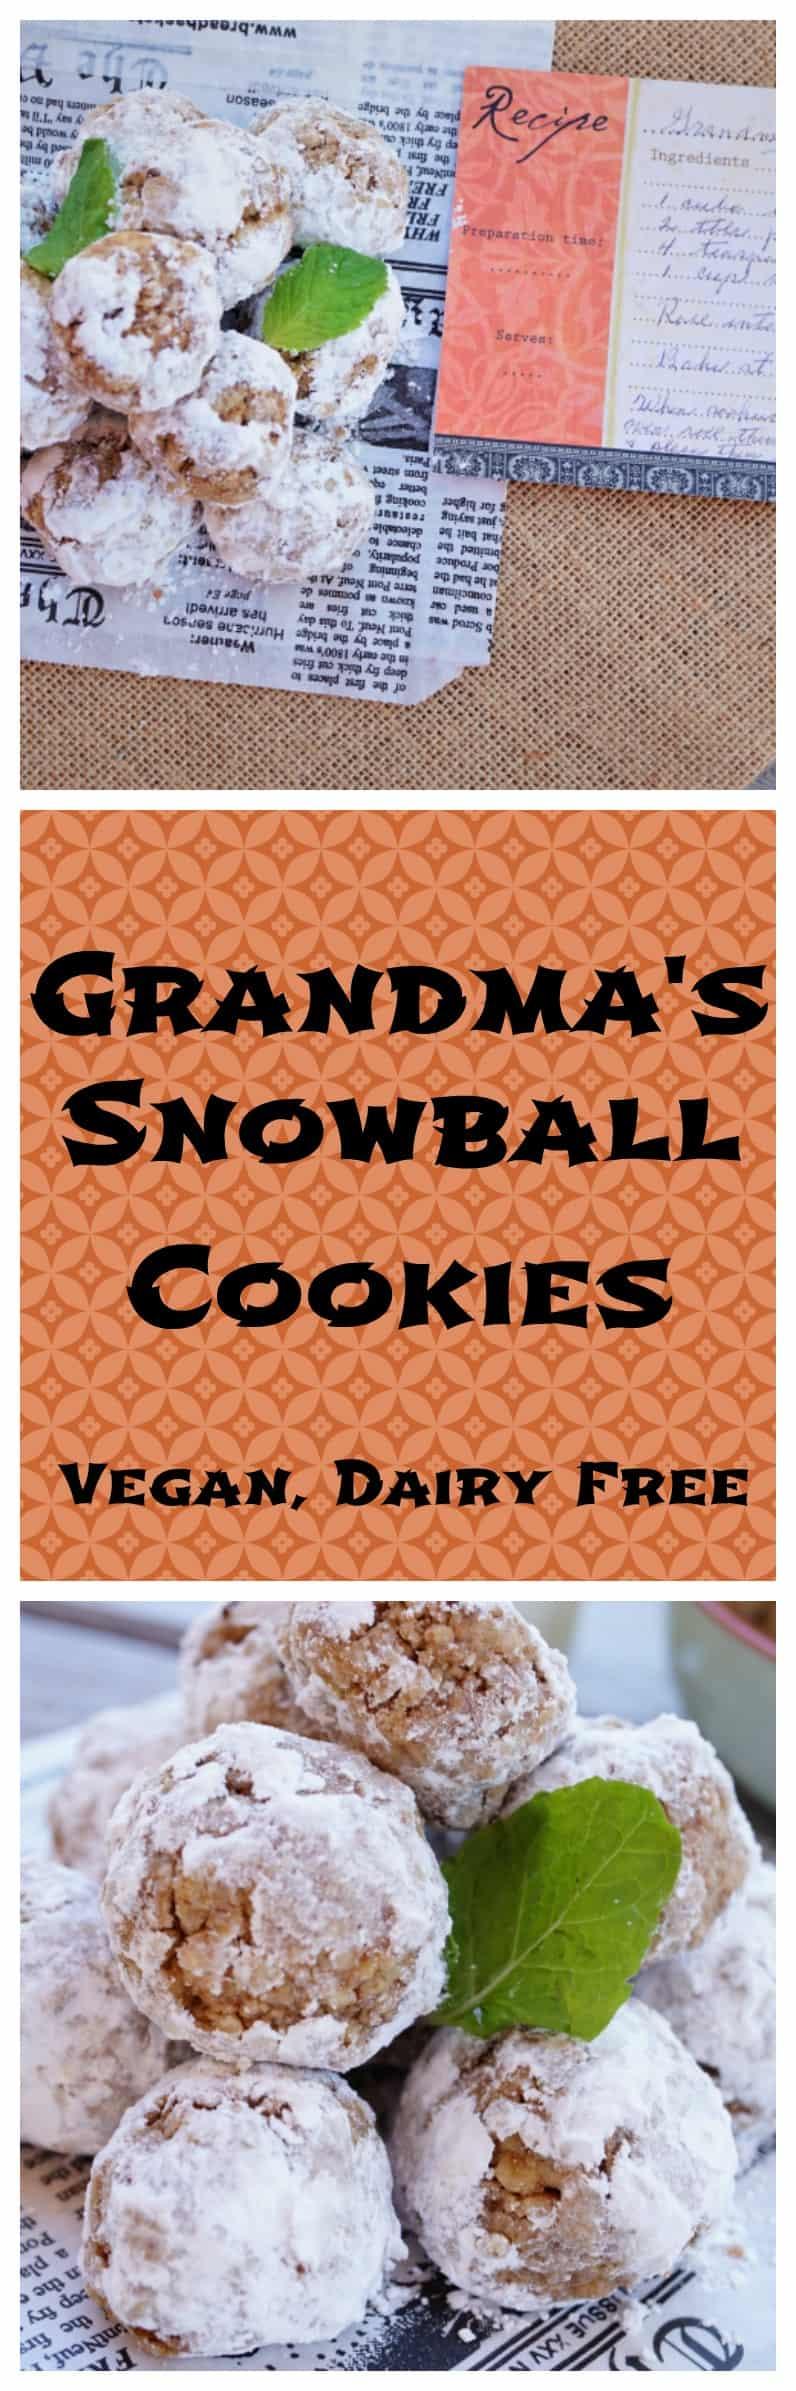 Healthy Snowball Cookies Vegan Grandpa Approved Shaw Simple Swaps